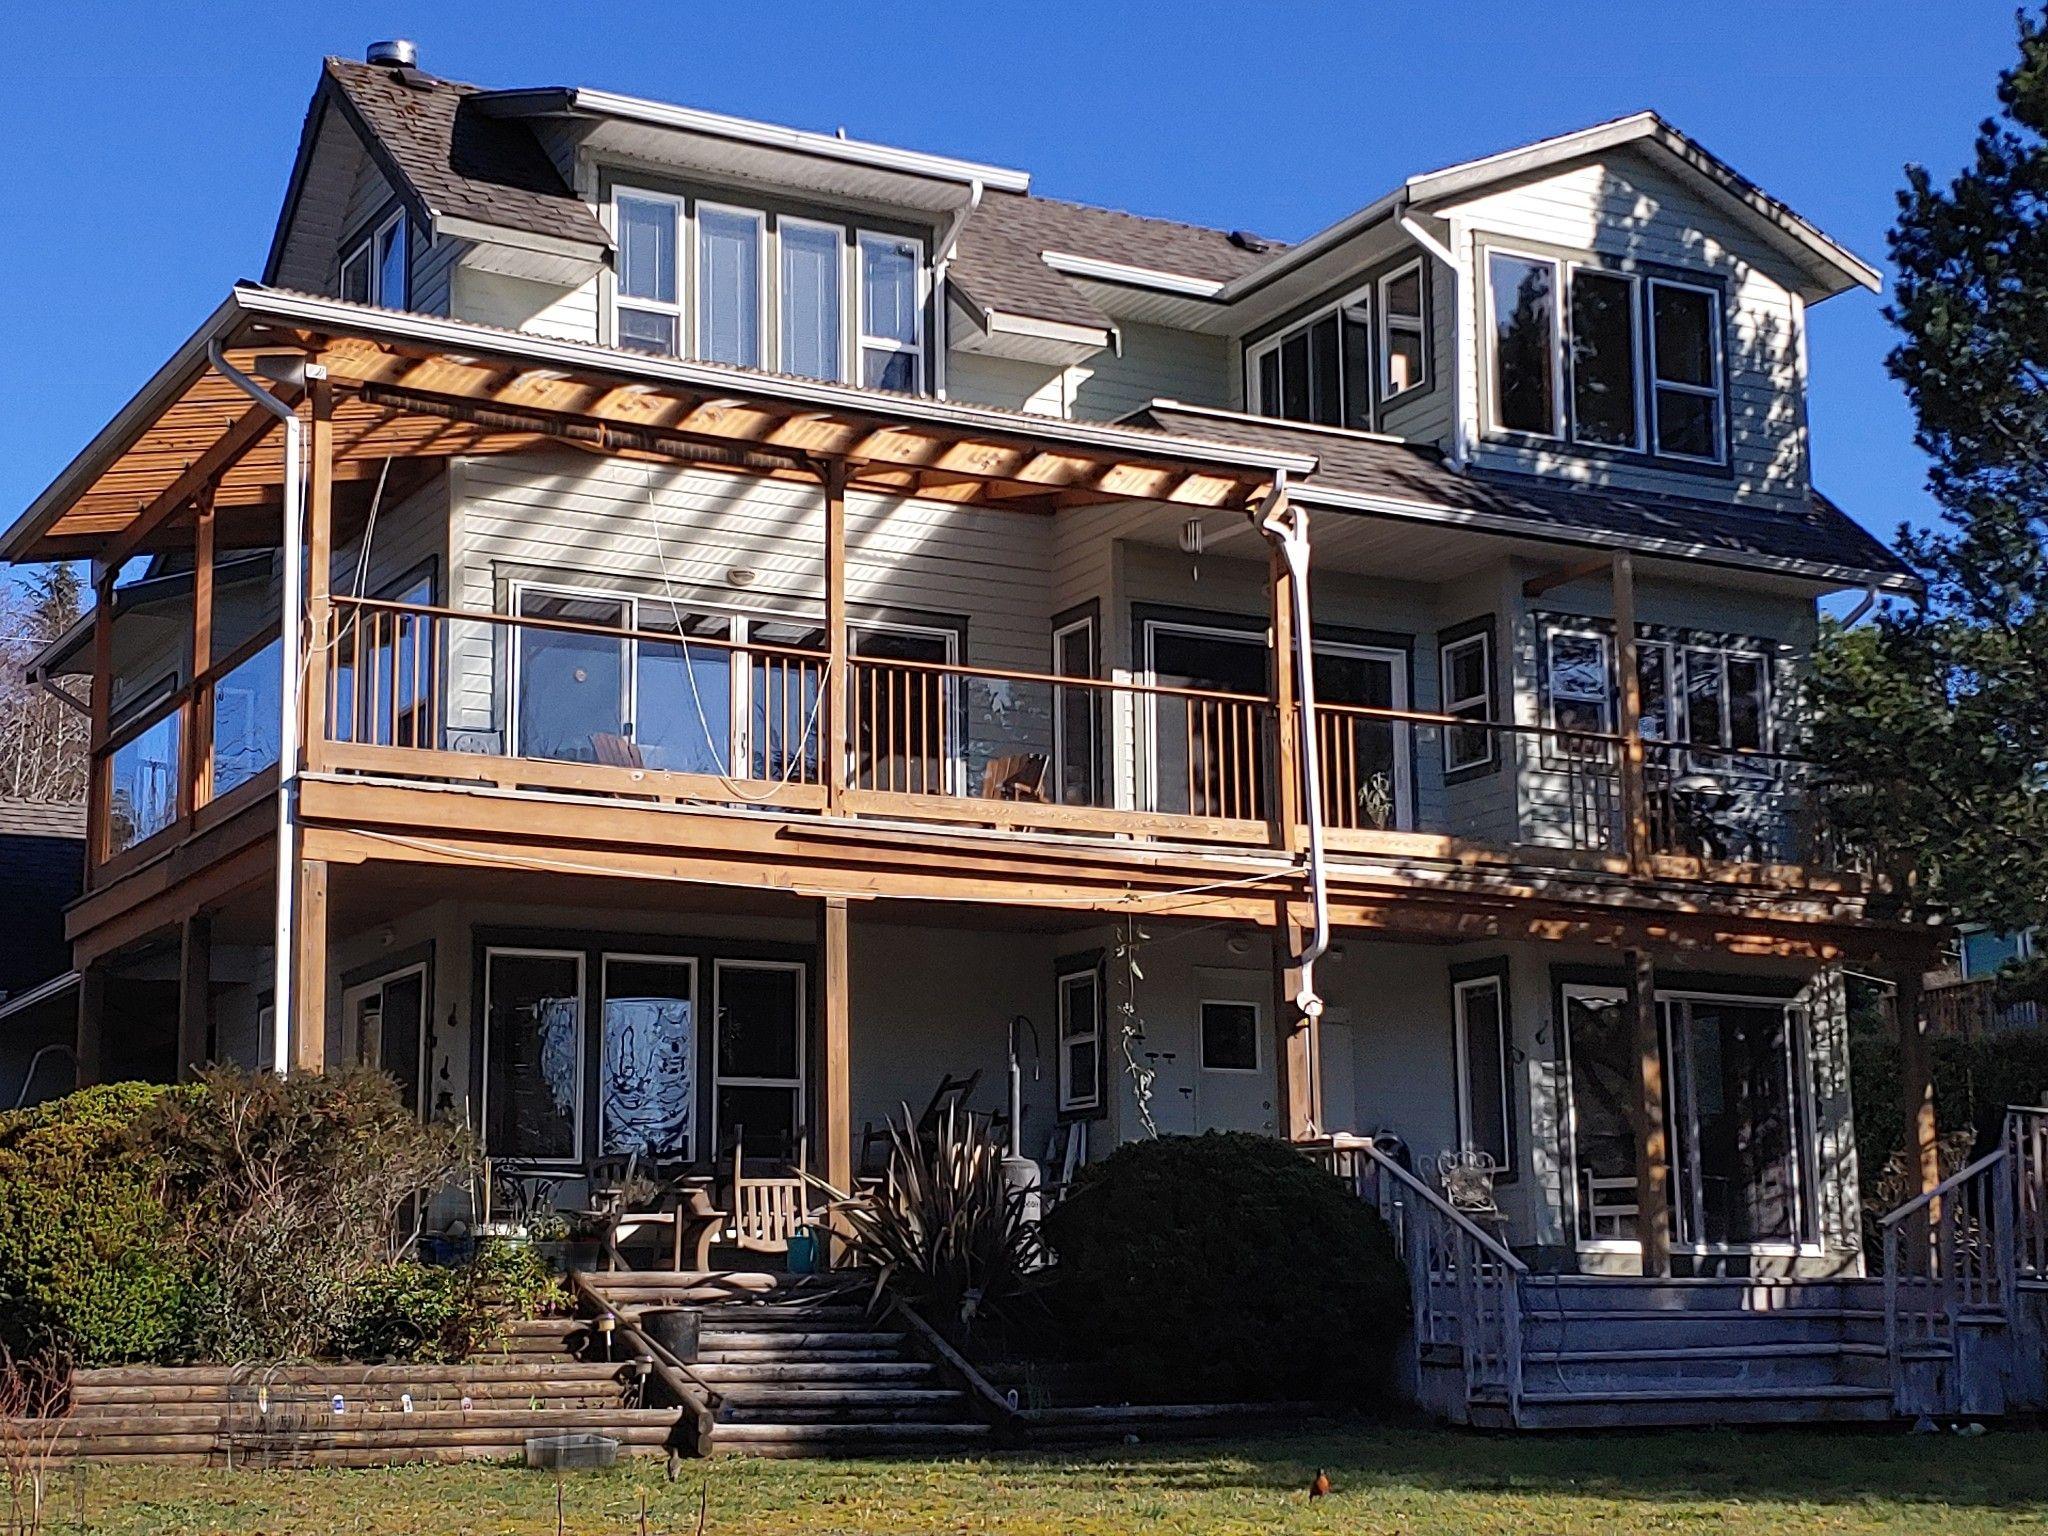 Main Photo: 462 Pachena Road in Bamfield: House for sale : MLS®# 865724